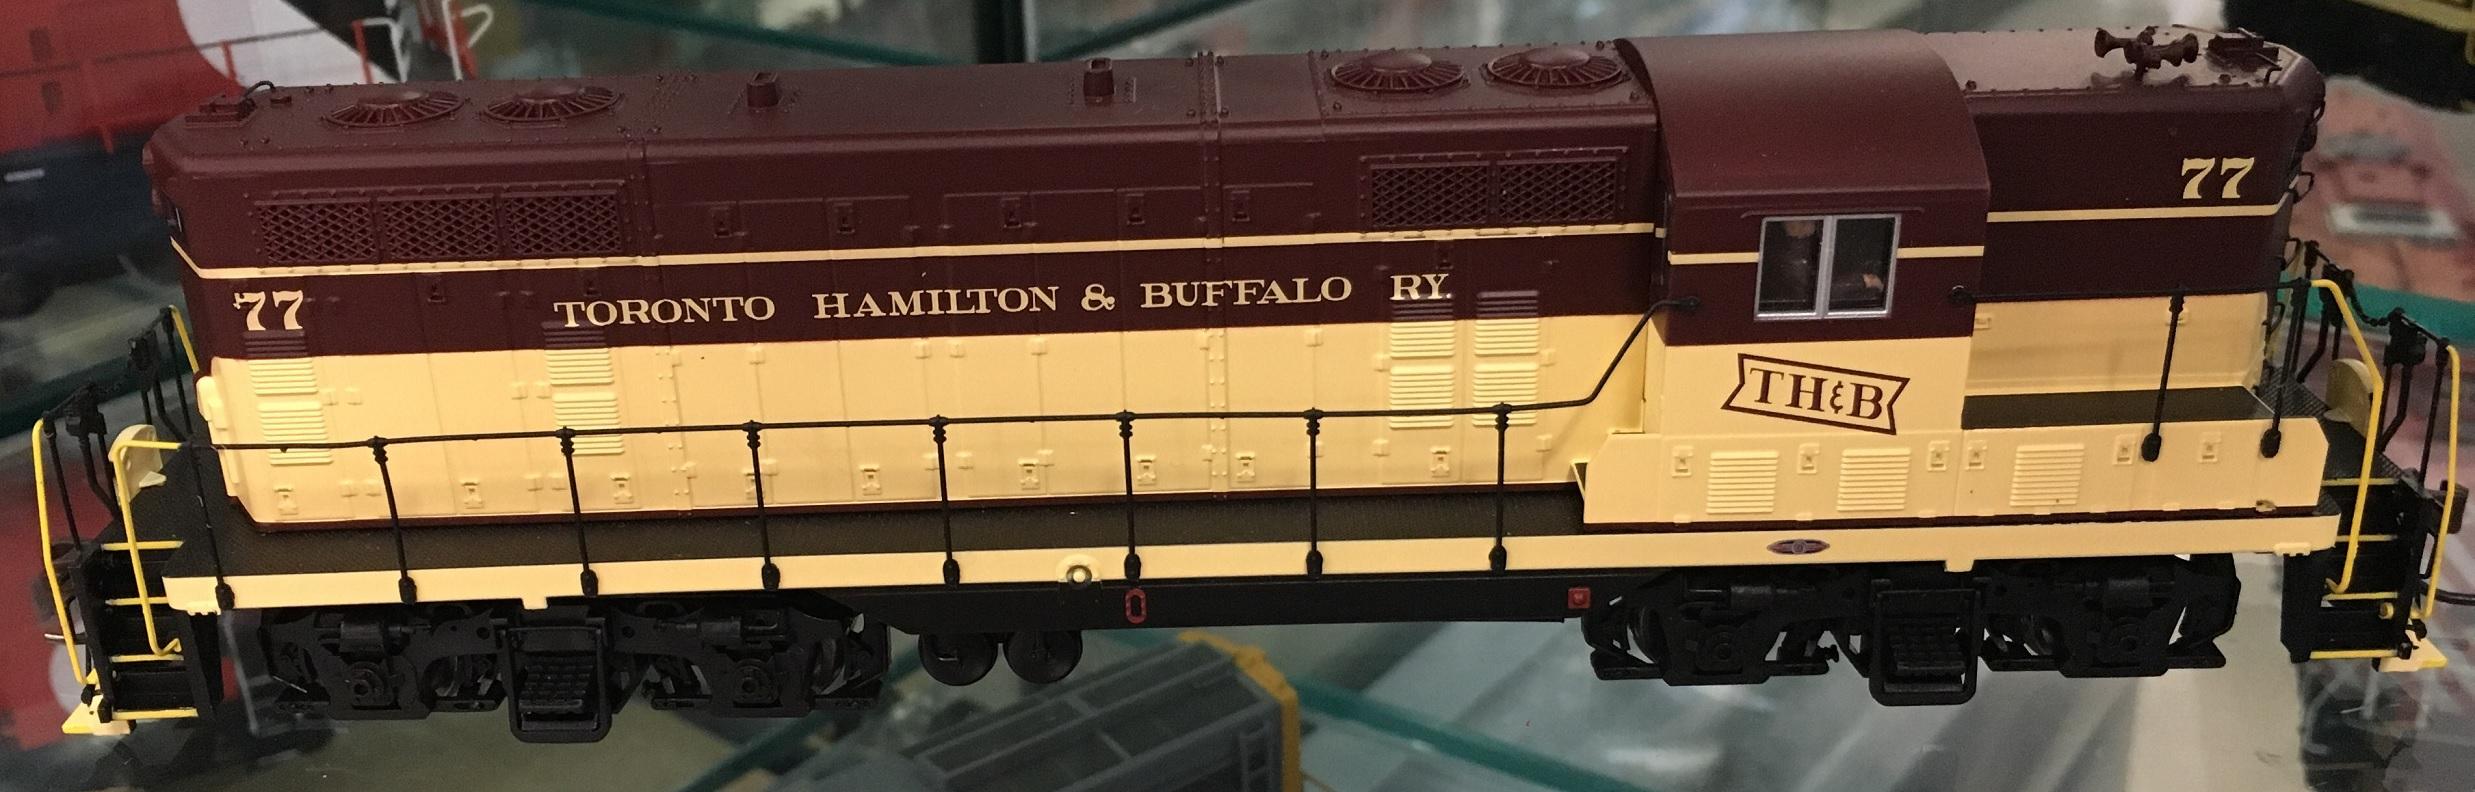 Atlas 10002984 HO - Master Line GP-7 - DCC Ready - Toronto, Hamilton & Buffalo #72